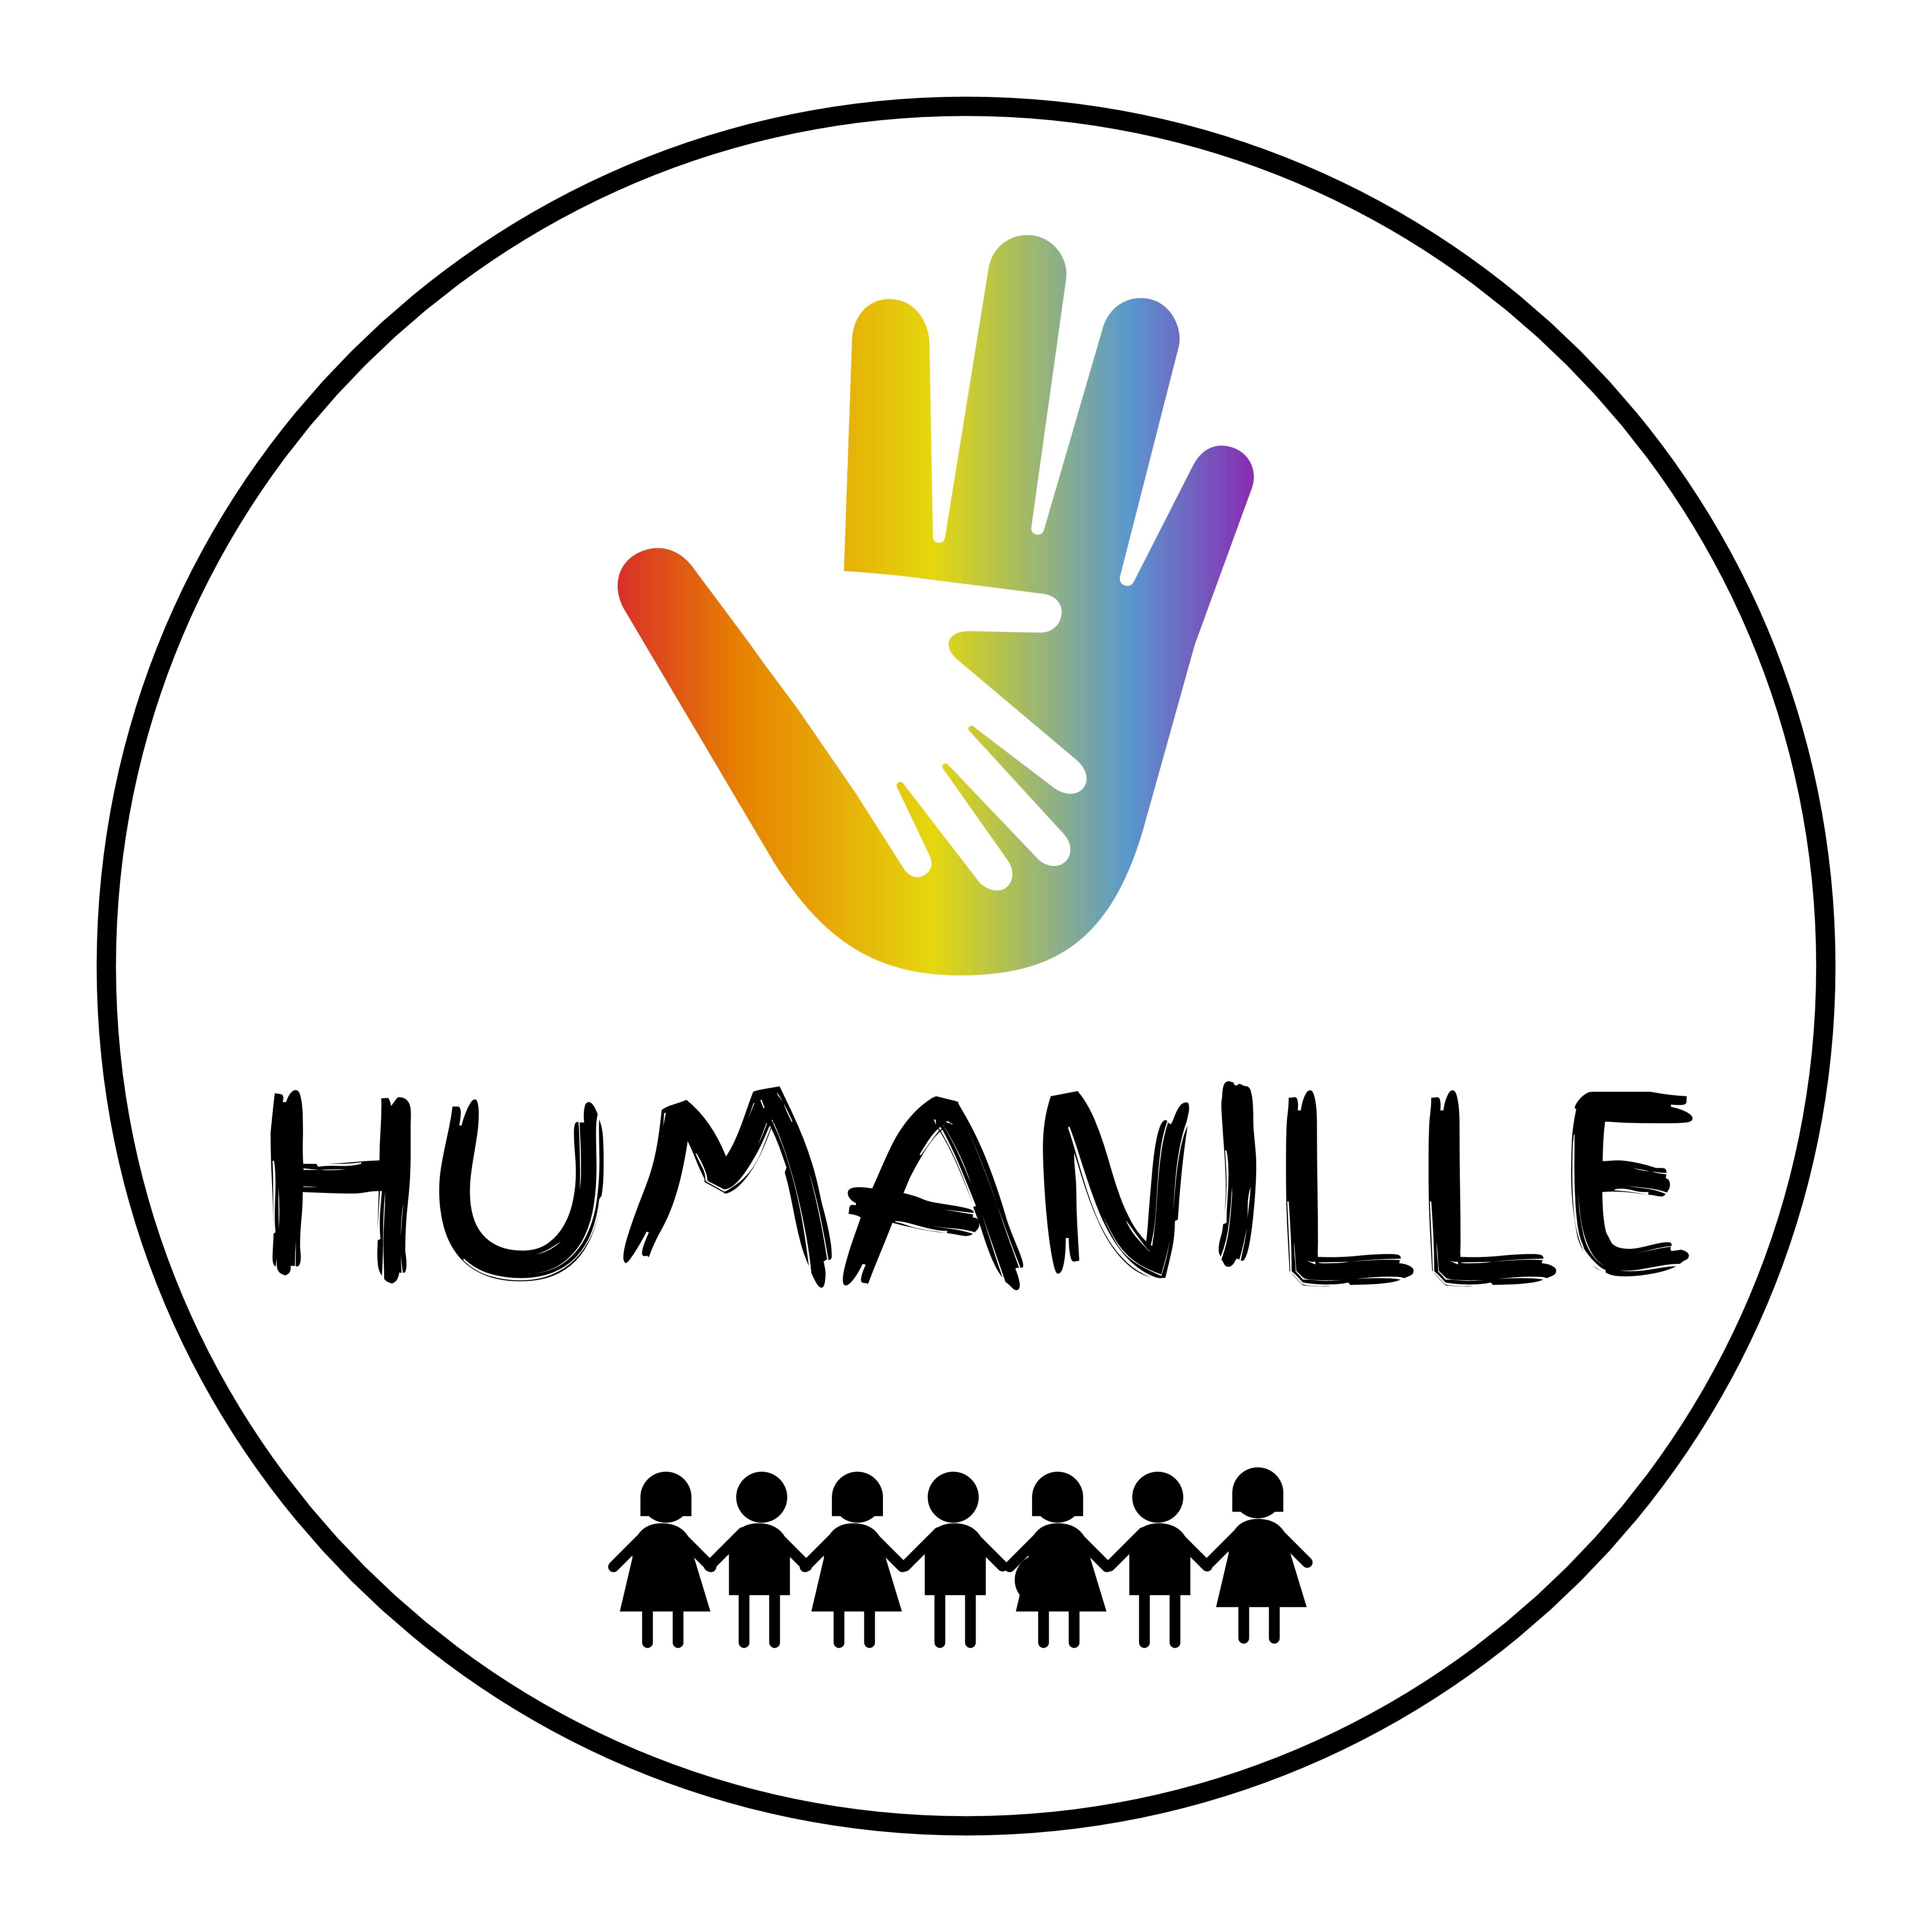 humanille logo